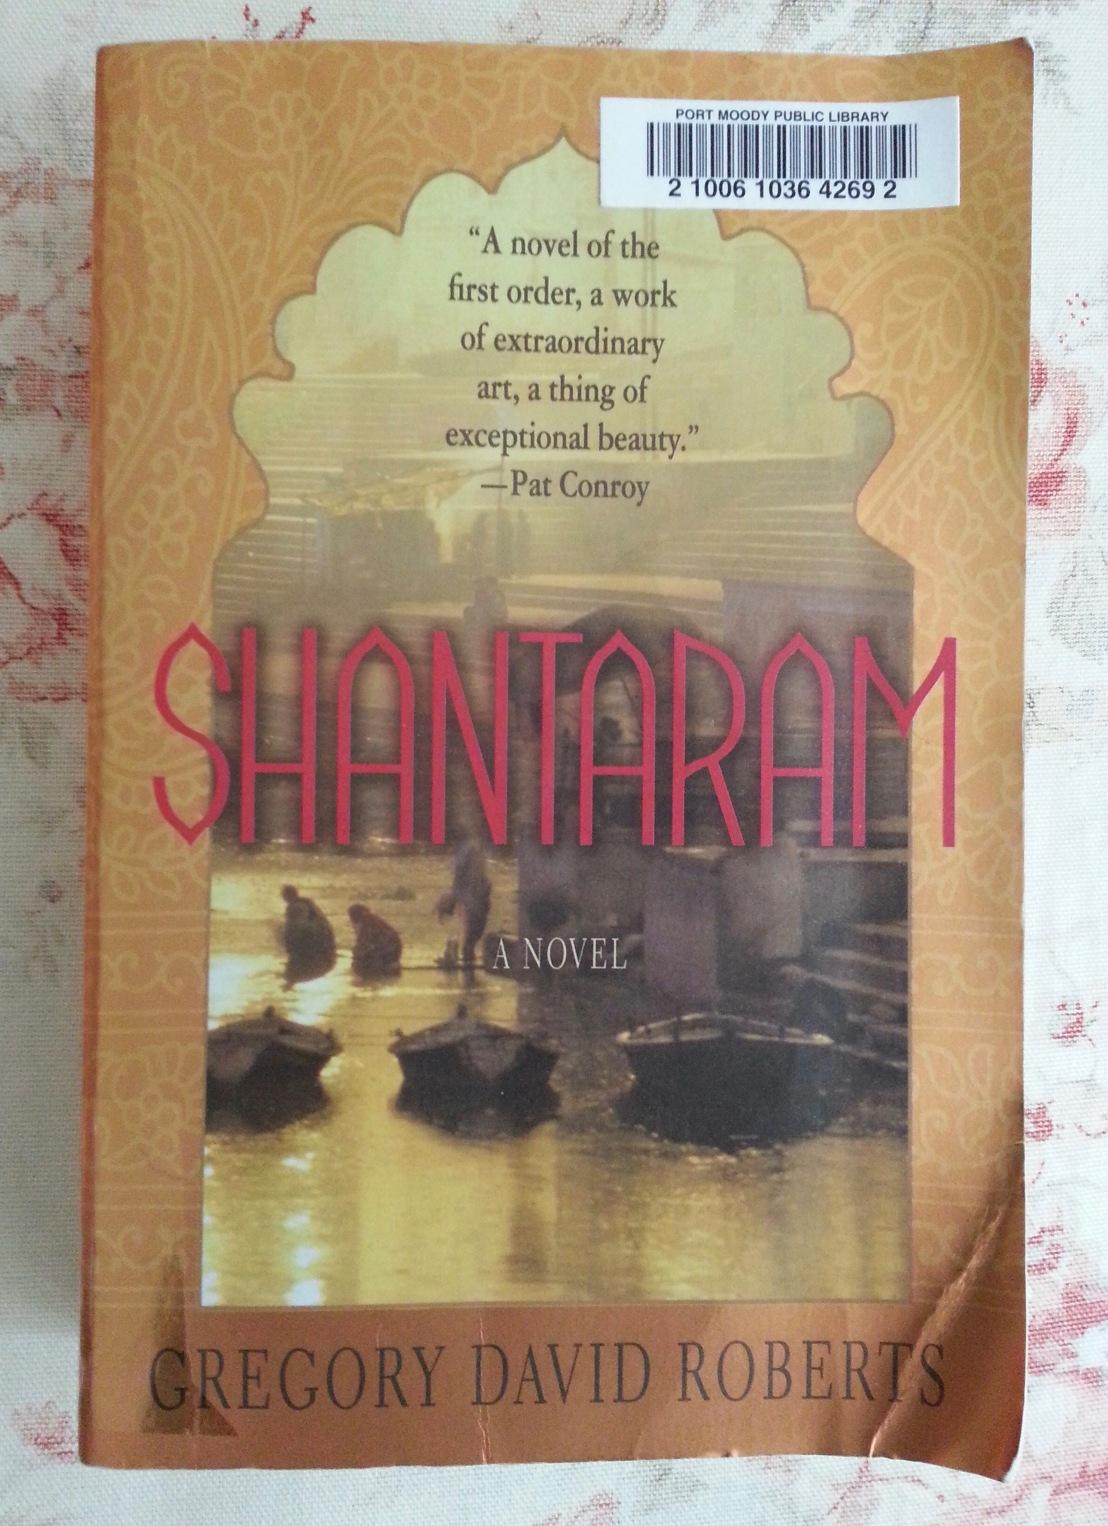 Gregory David Roberts' — Shantaram*****